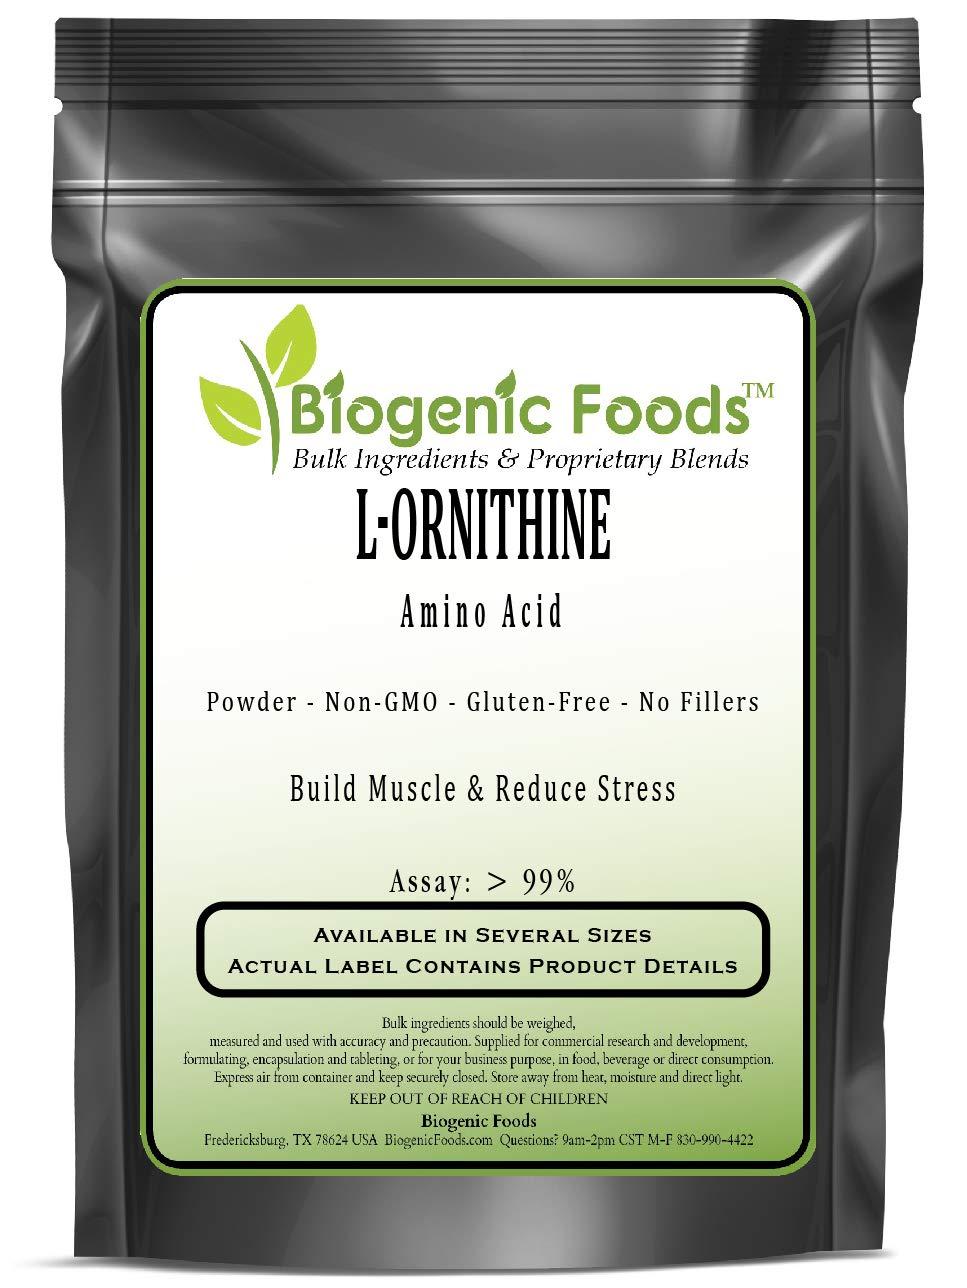 Ornithine (L) - L-Ornithine Amino Acid Powder (Assay: > 99%), 25 kg